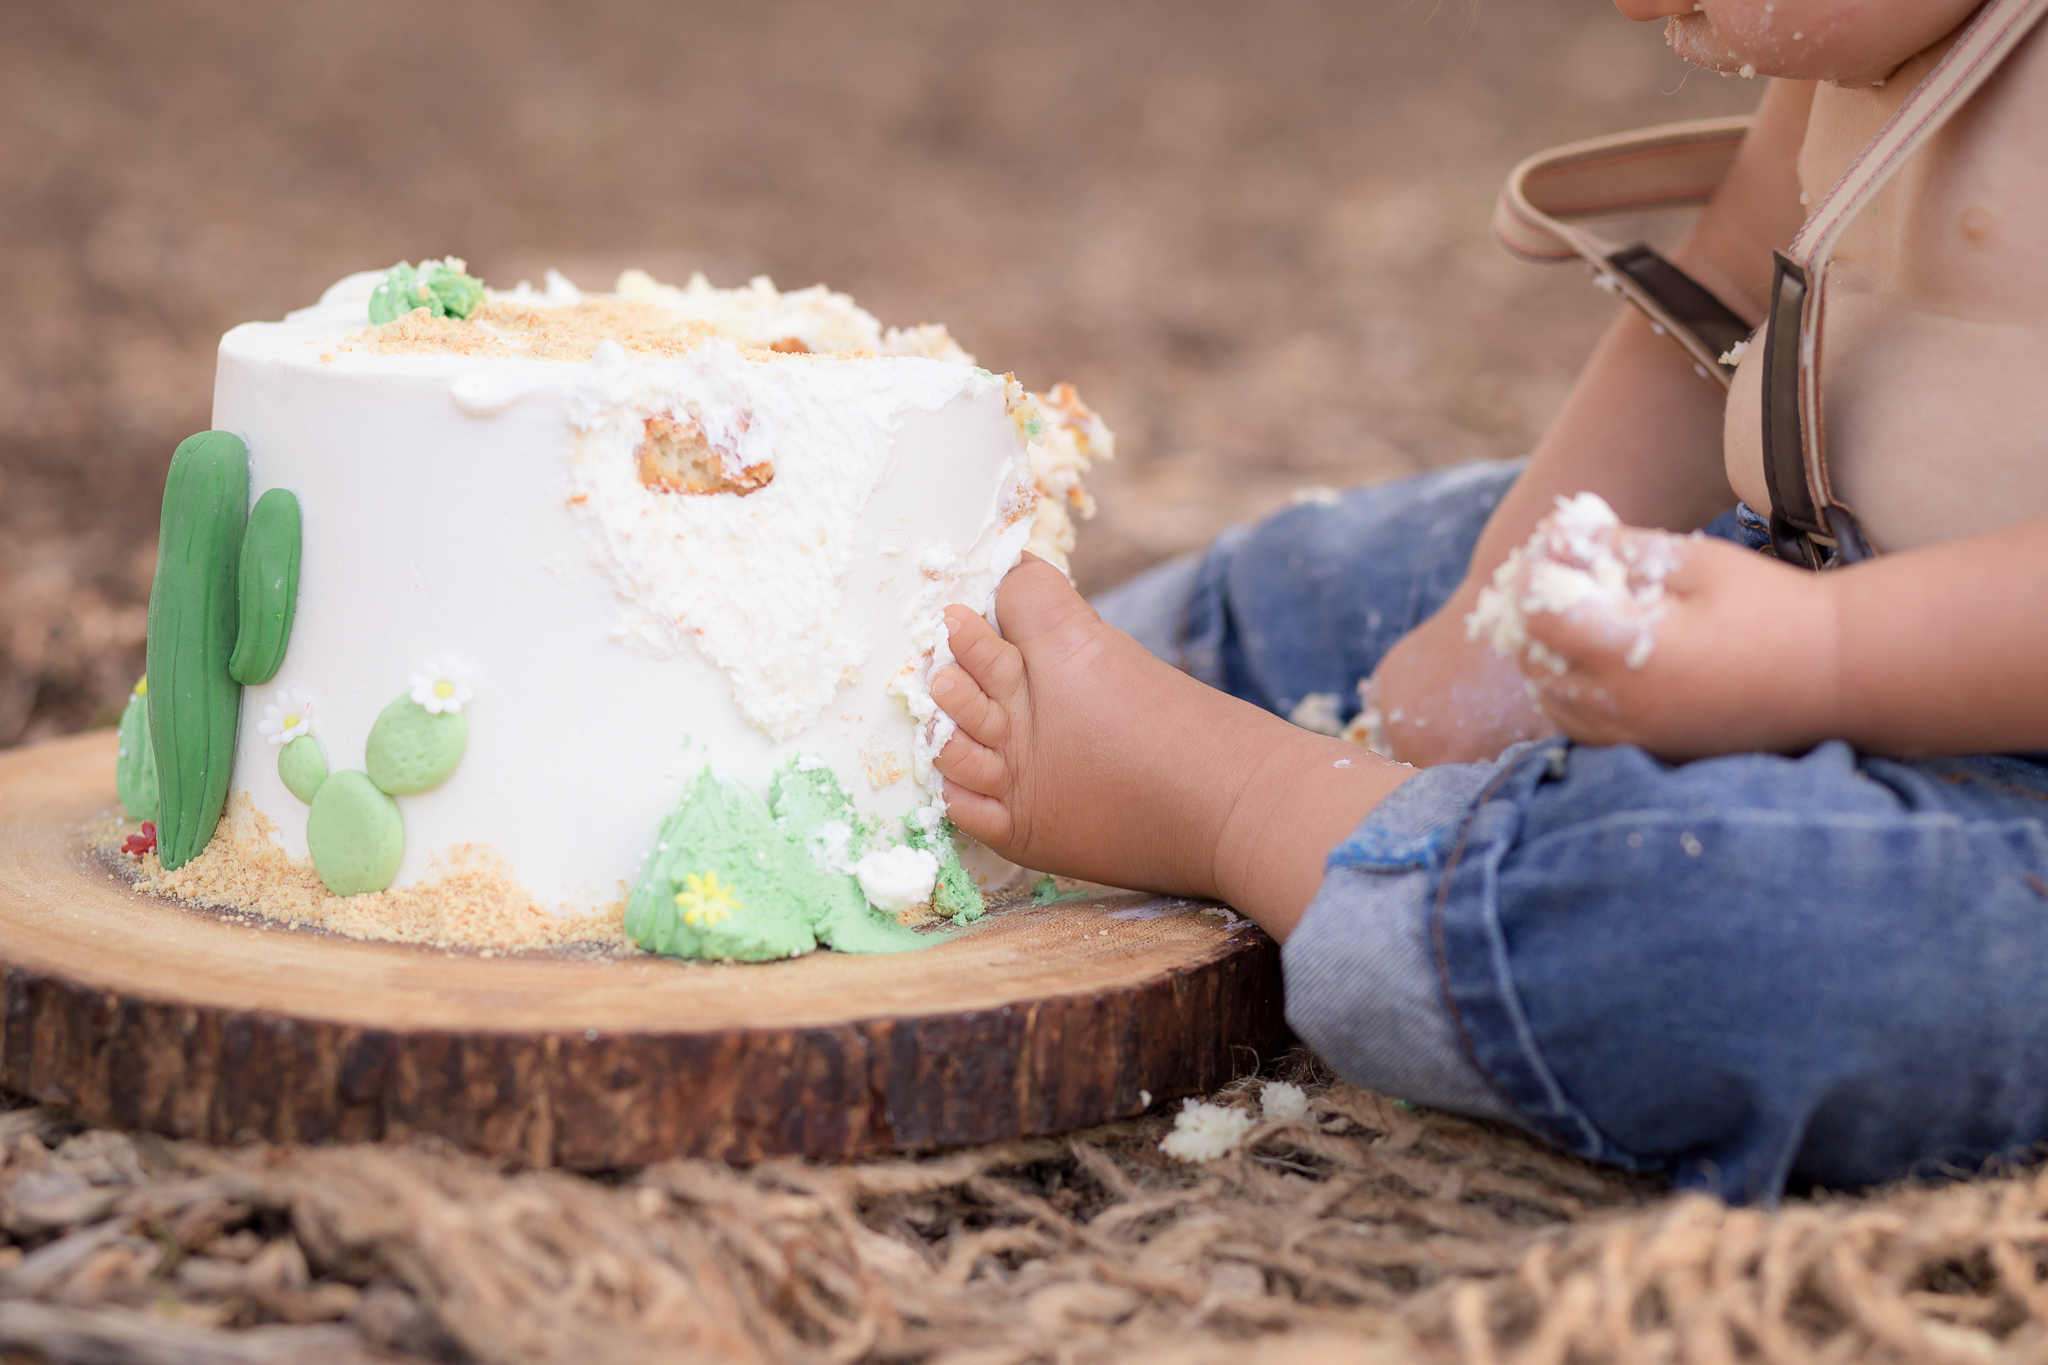 Cactus Cowboy Southwestern Cake Smash- Oh My Goddard Photography - San Diego Oceanside Cake Smash Photographer-22.jpg